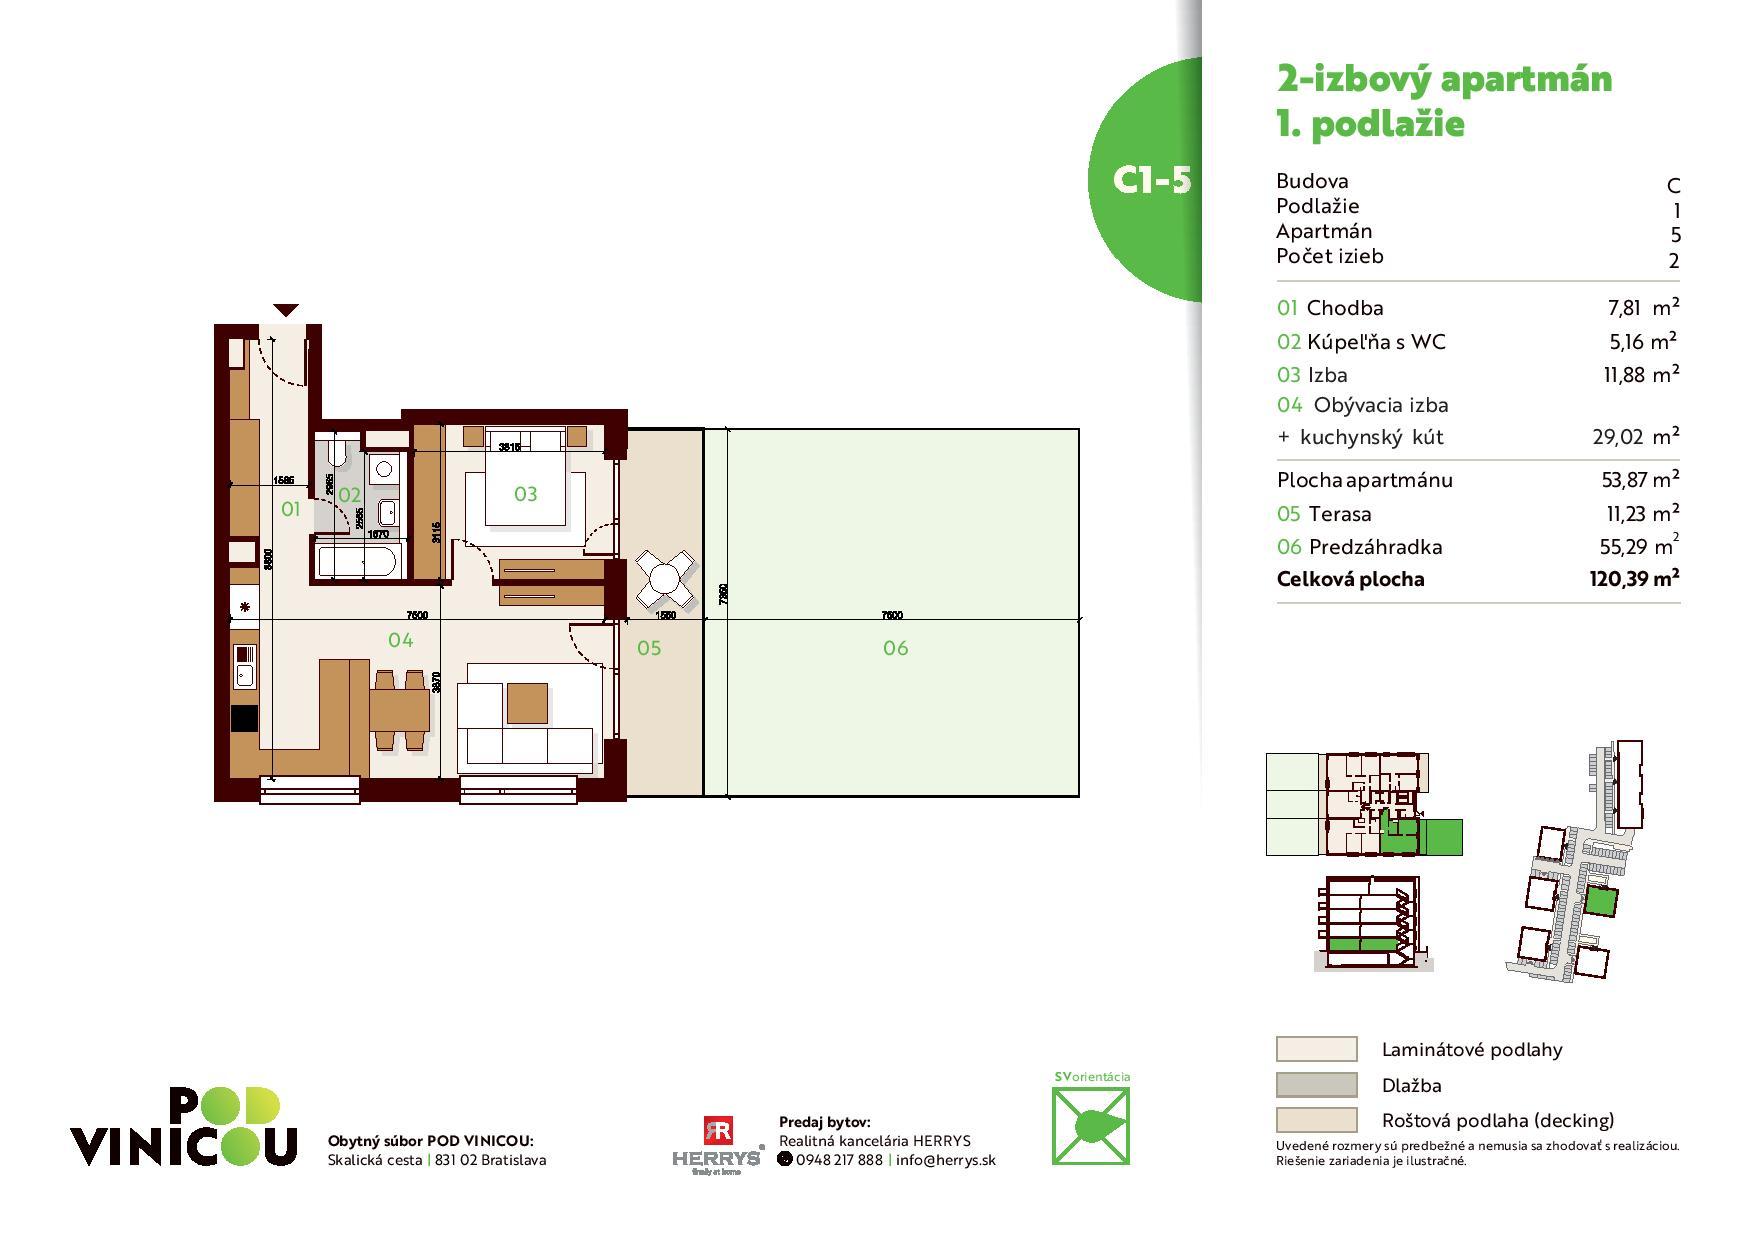 Pod Vinicou - Detail bytu C.1.5 apartman